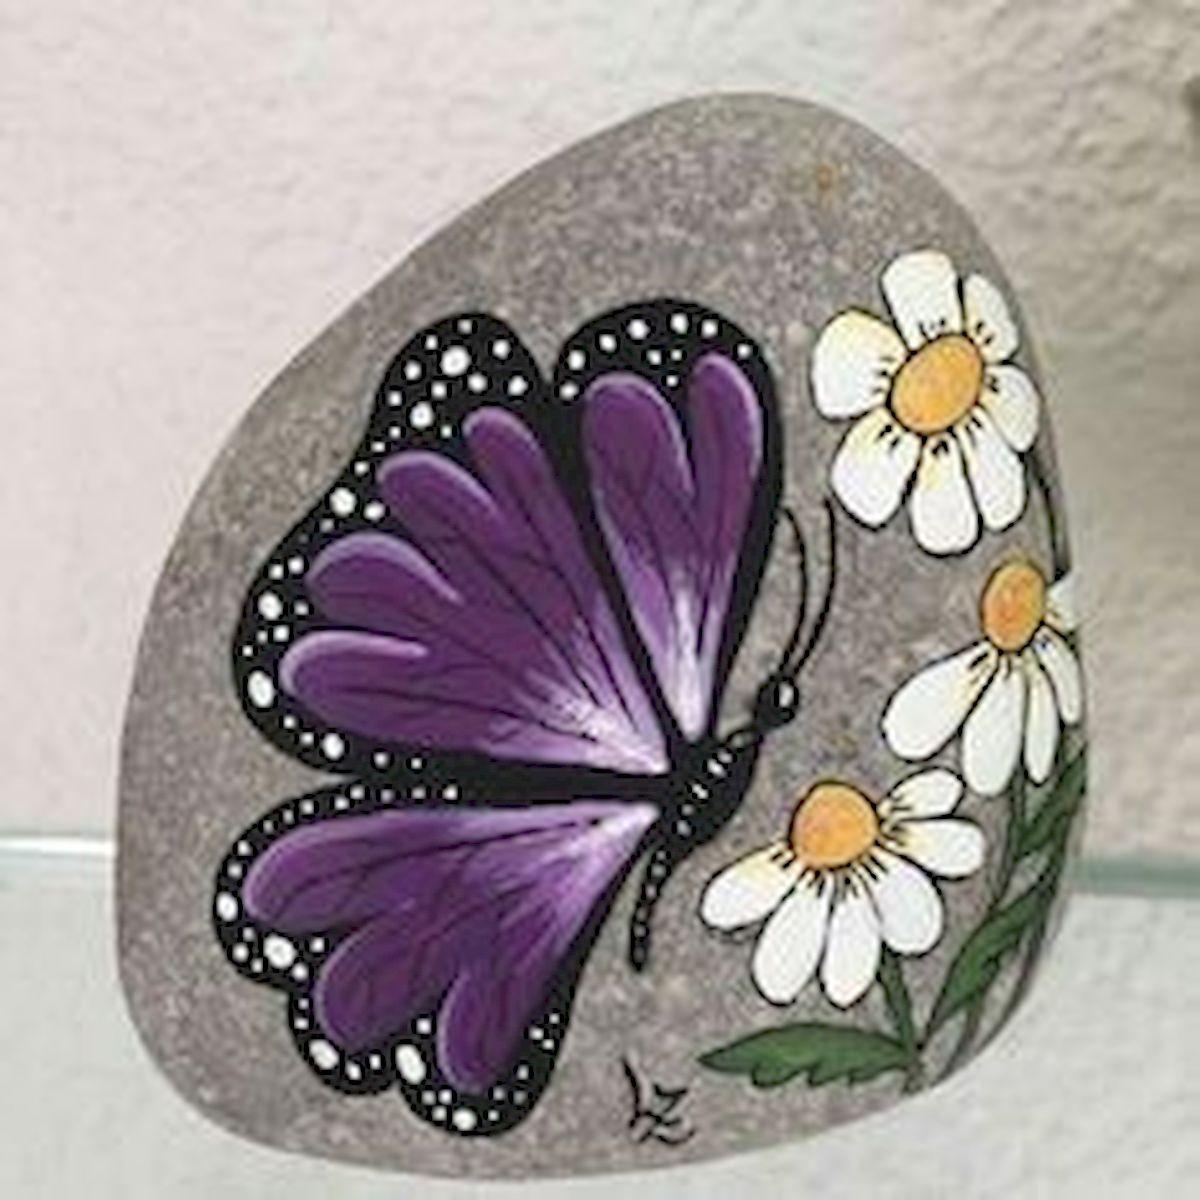 55 Cute DIY Painted Rocks Animals Butterfly Ideas (52)